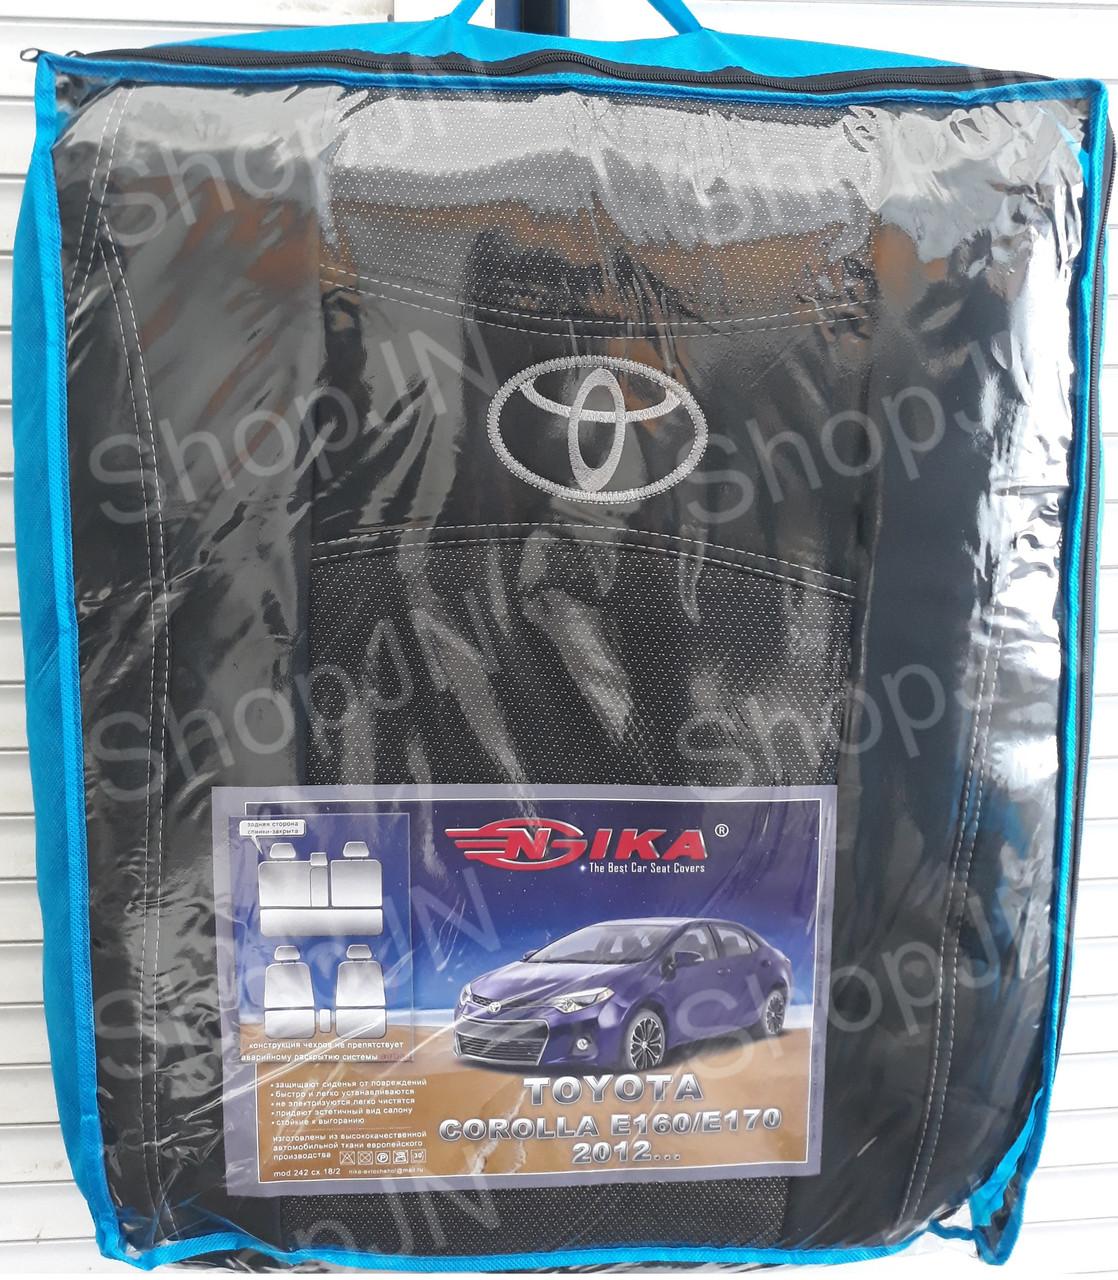 Авточехлы Toyota Corolla E 160 / E 170 2012- Nika